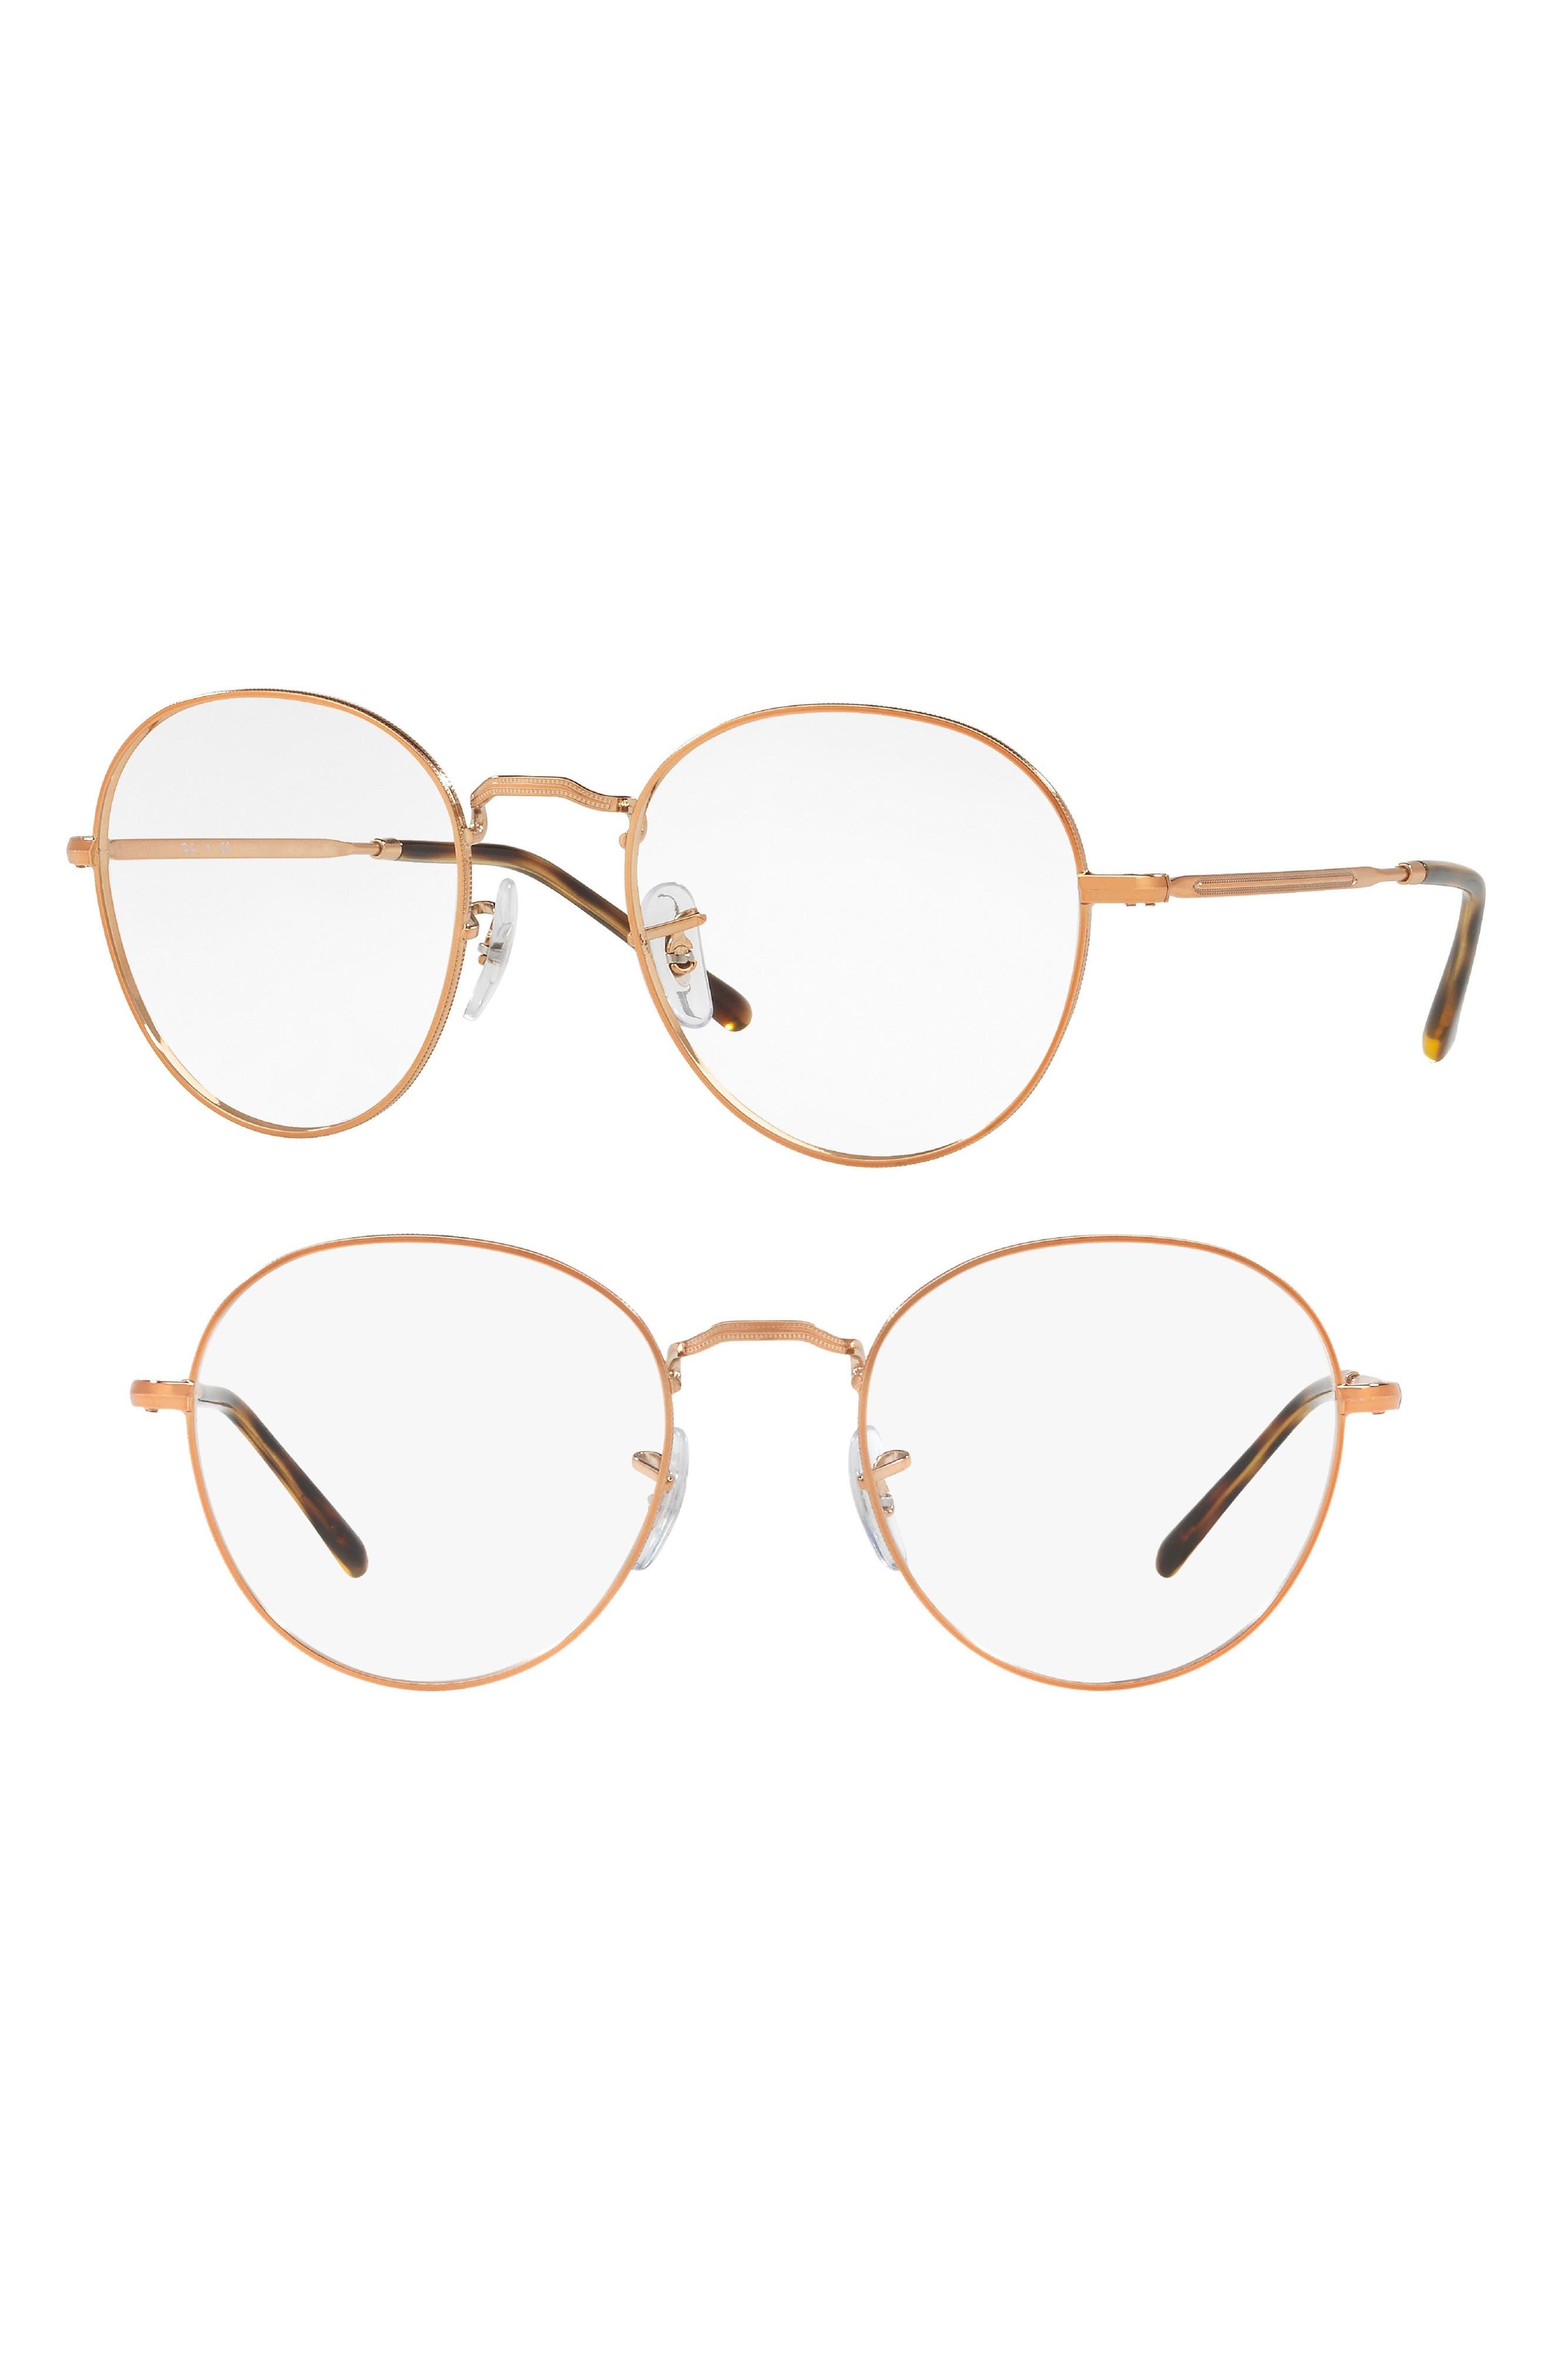 3582V 51mm Optical Glasses,                             Main thumbnail 2, color,